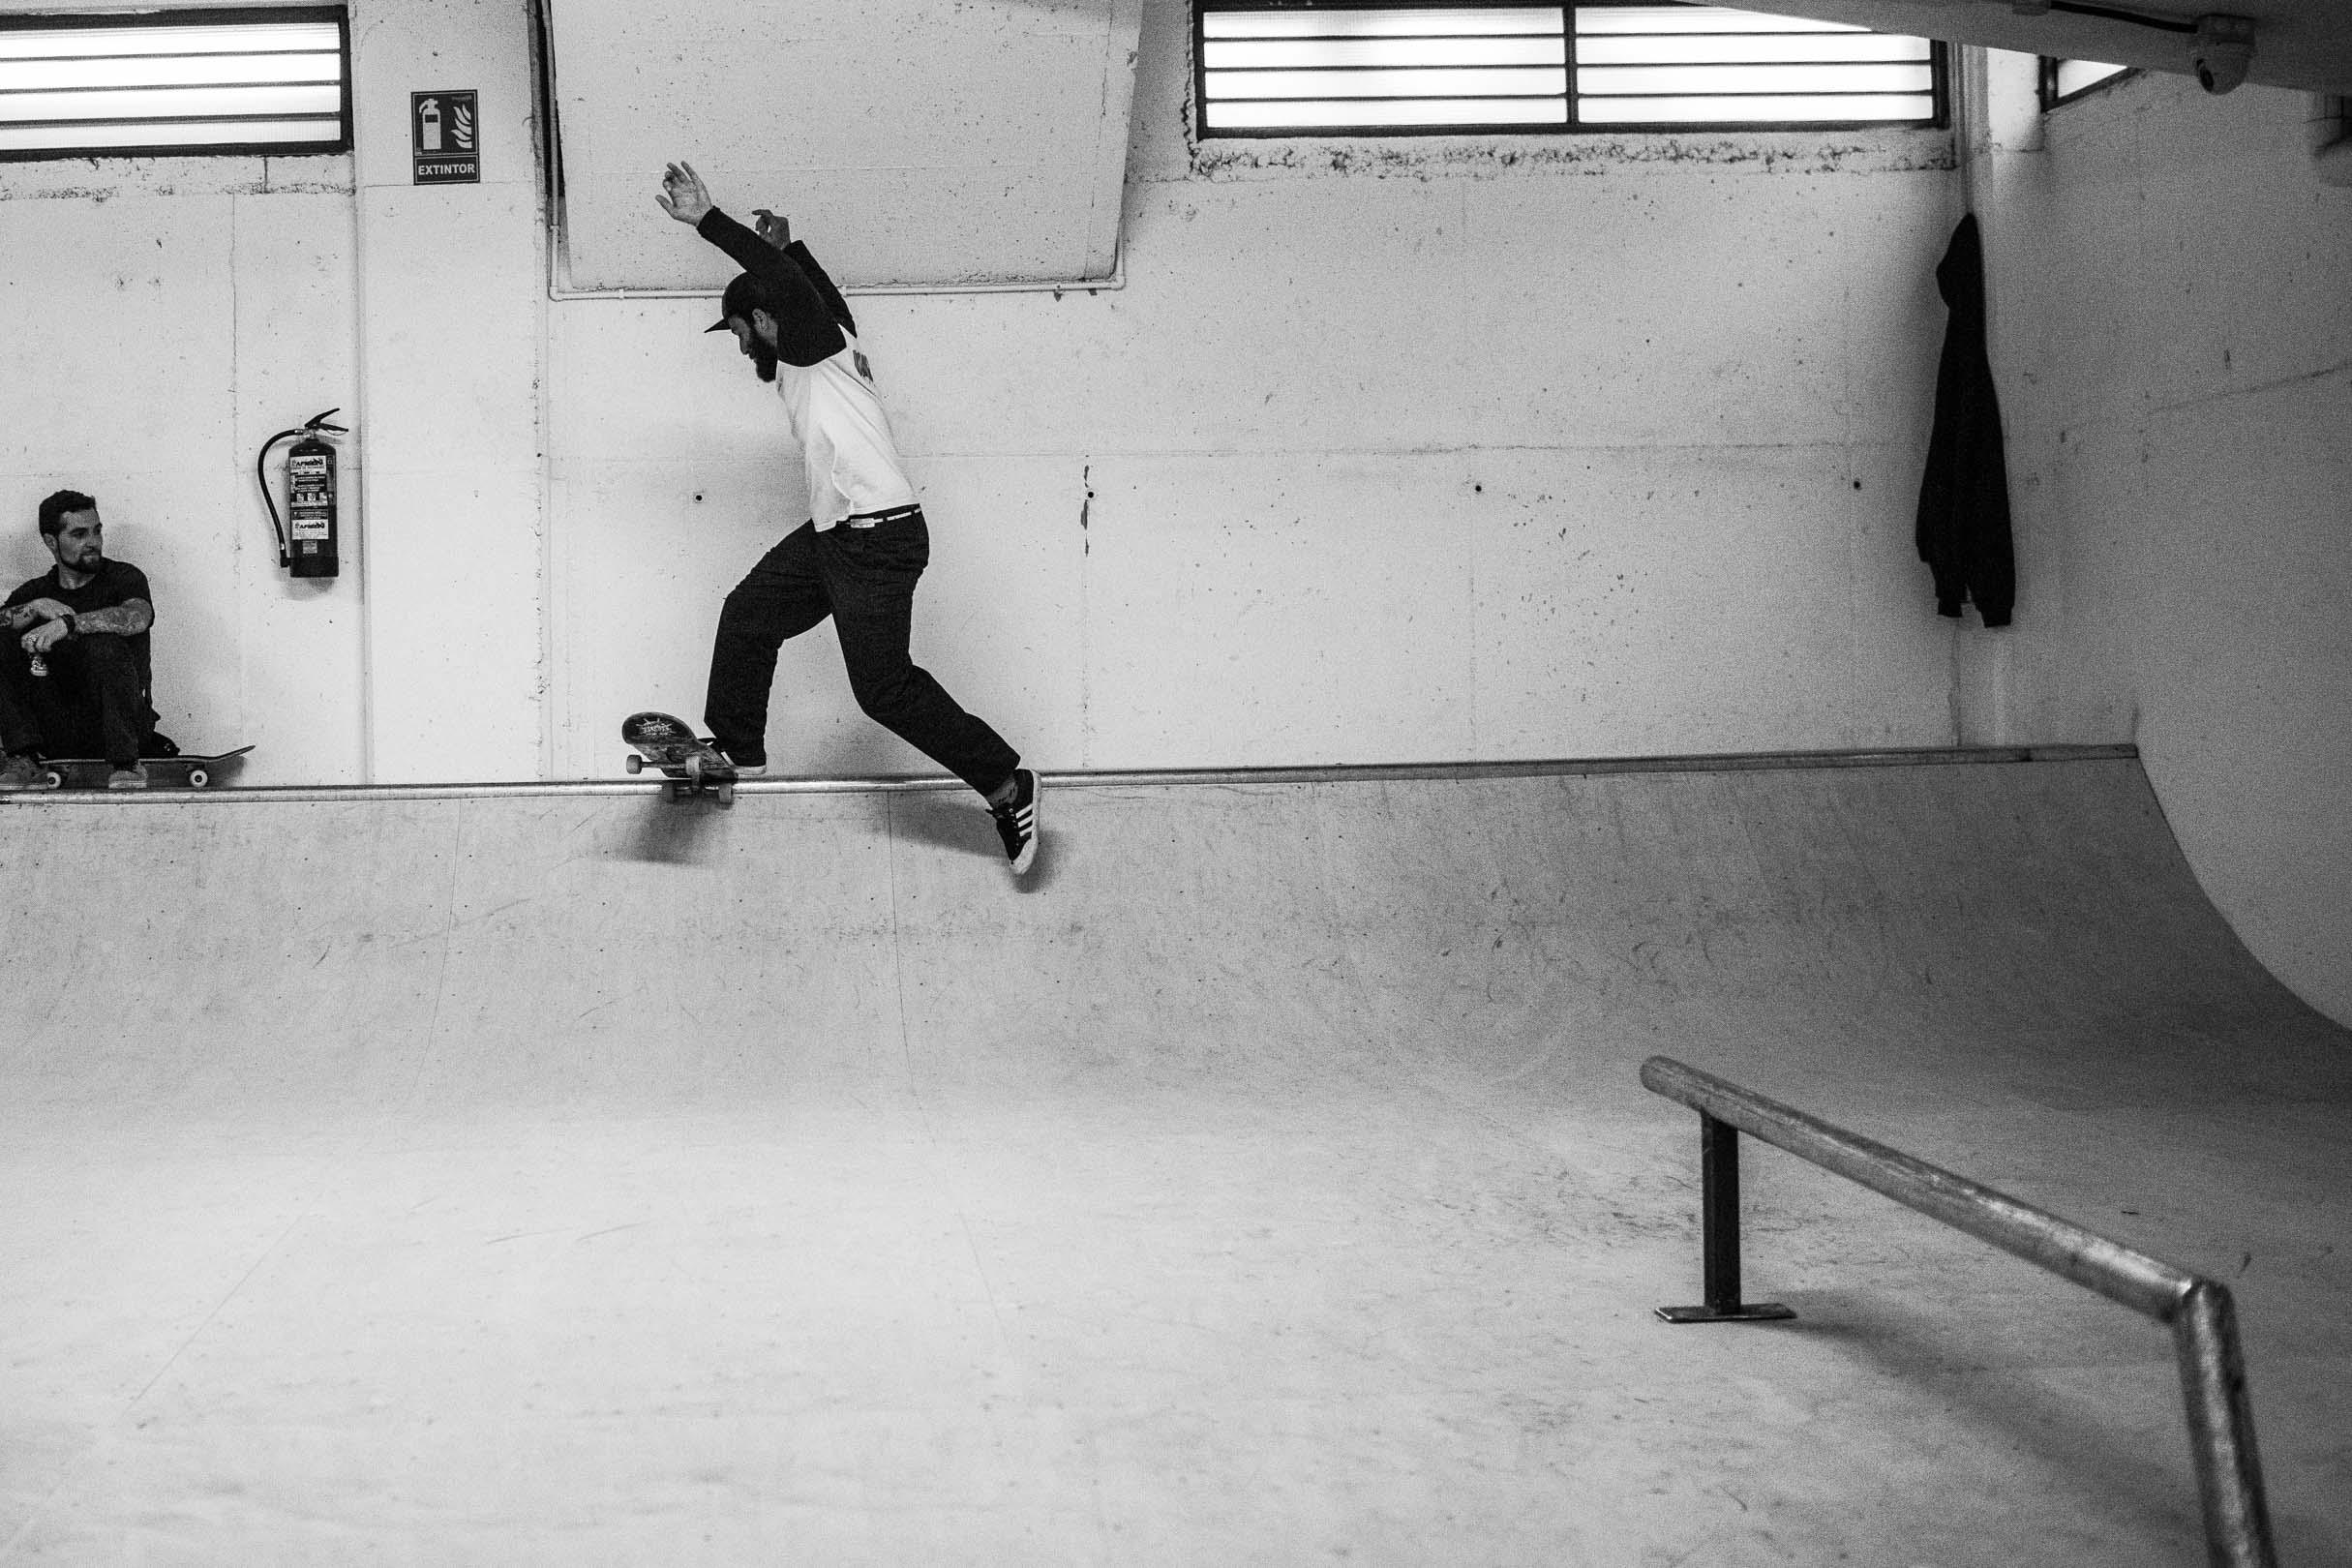 coruna-fotografia-skate-11.jpg